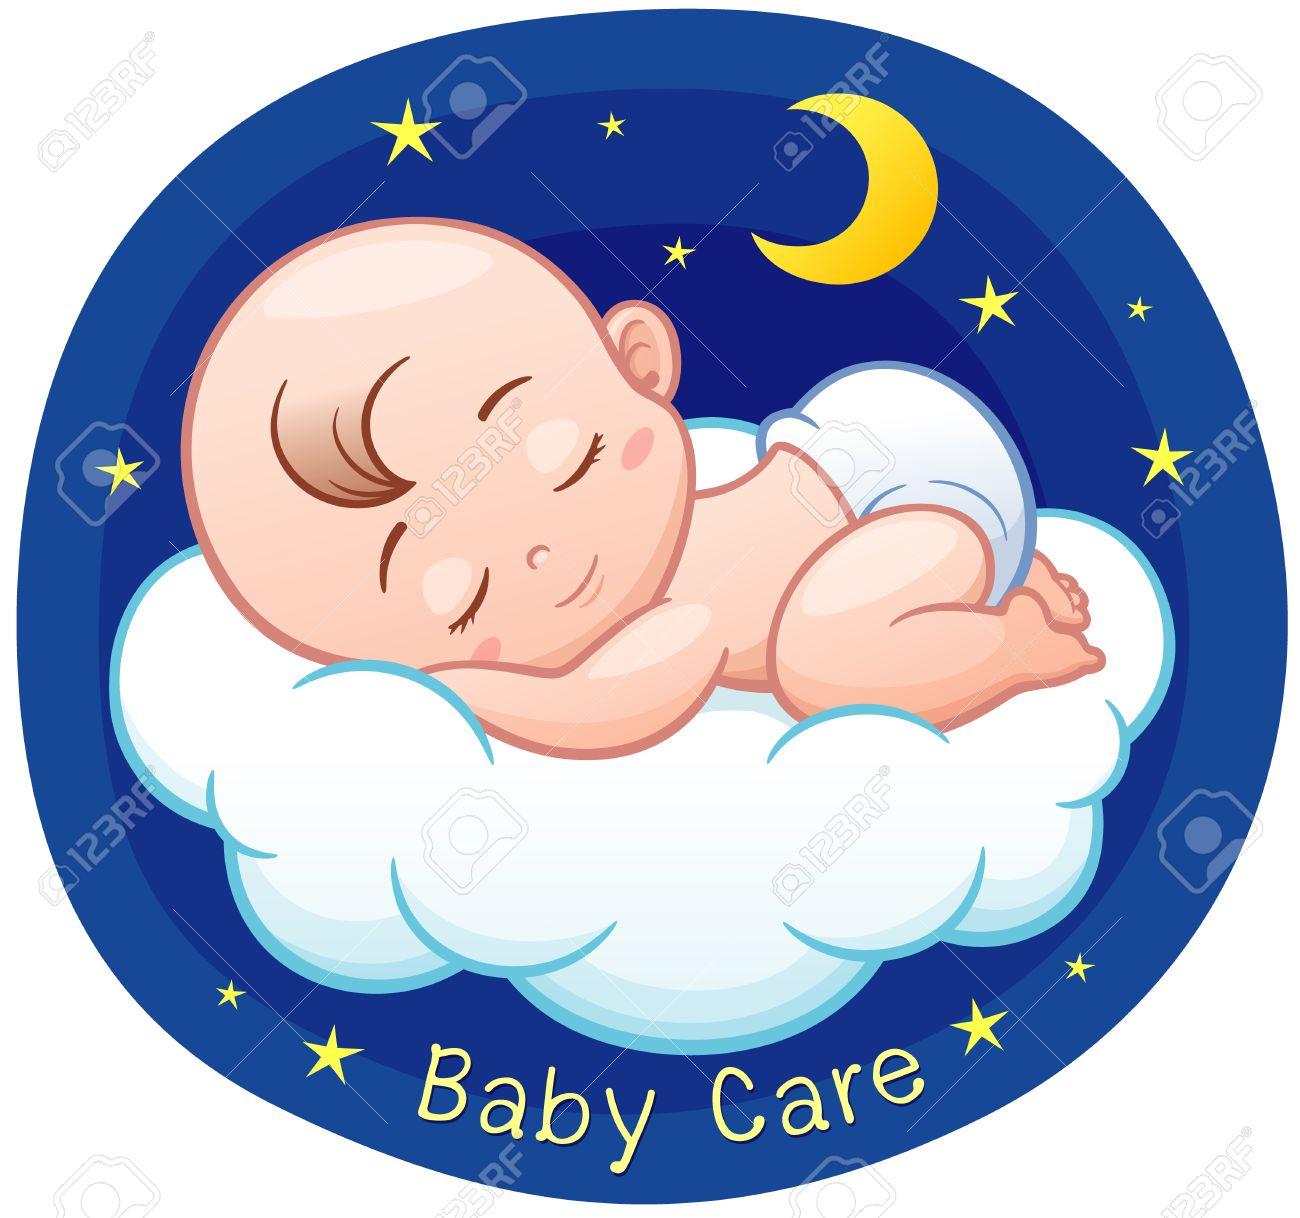 Vector Illustration of Cartoon Baby sleeping on a cloud - 66380291